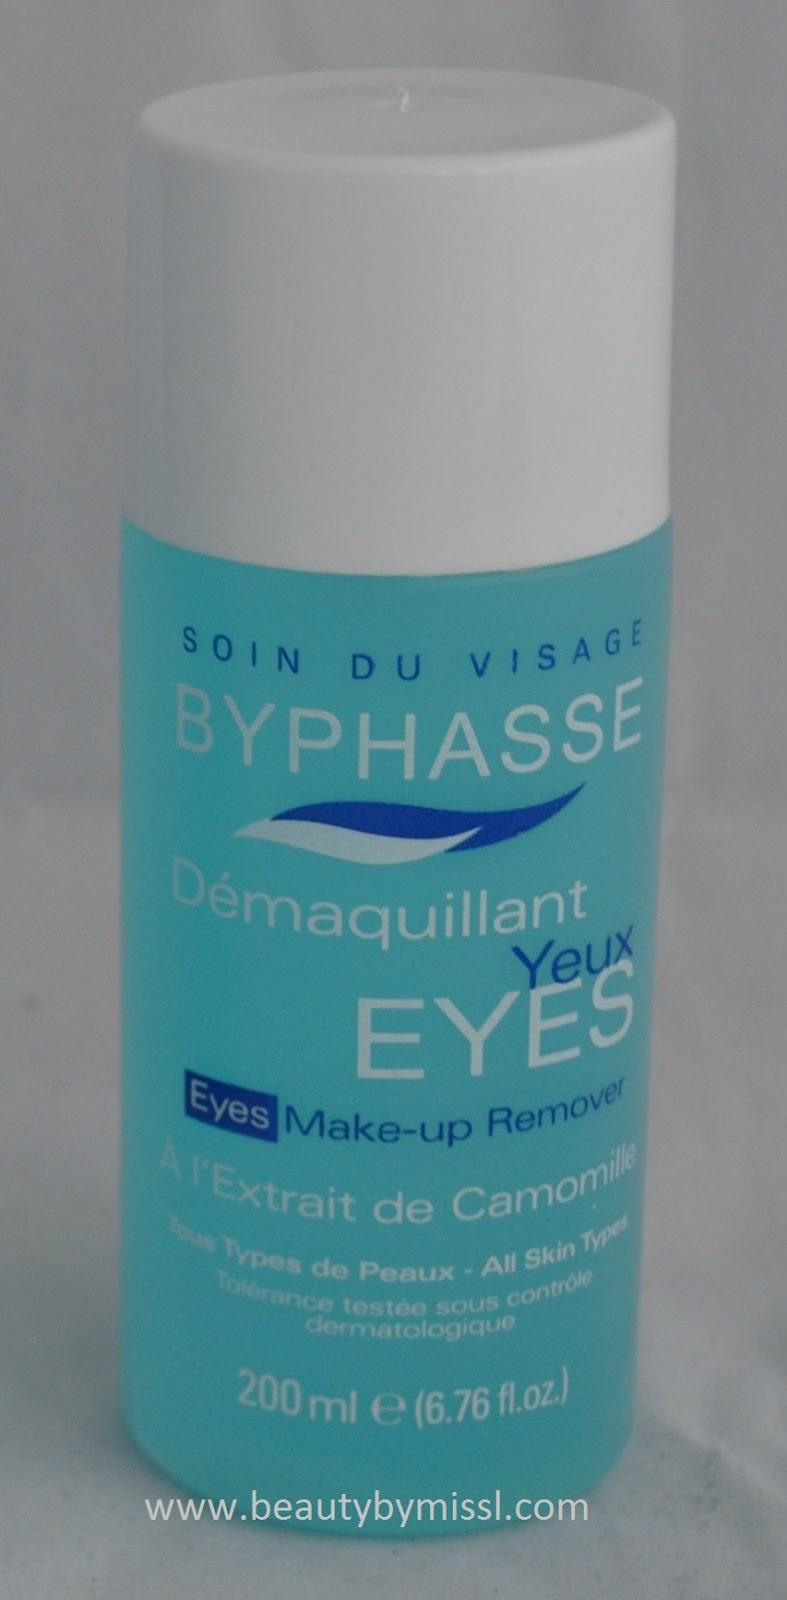 Byphasse silmameigieemaldaja